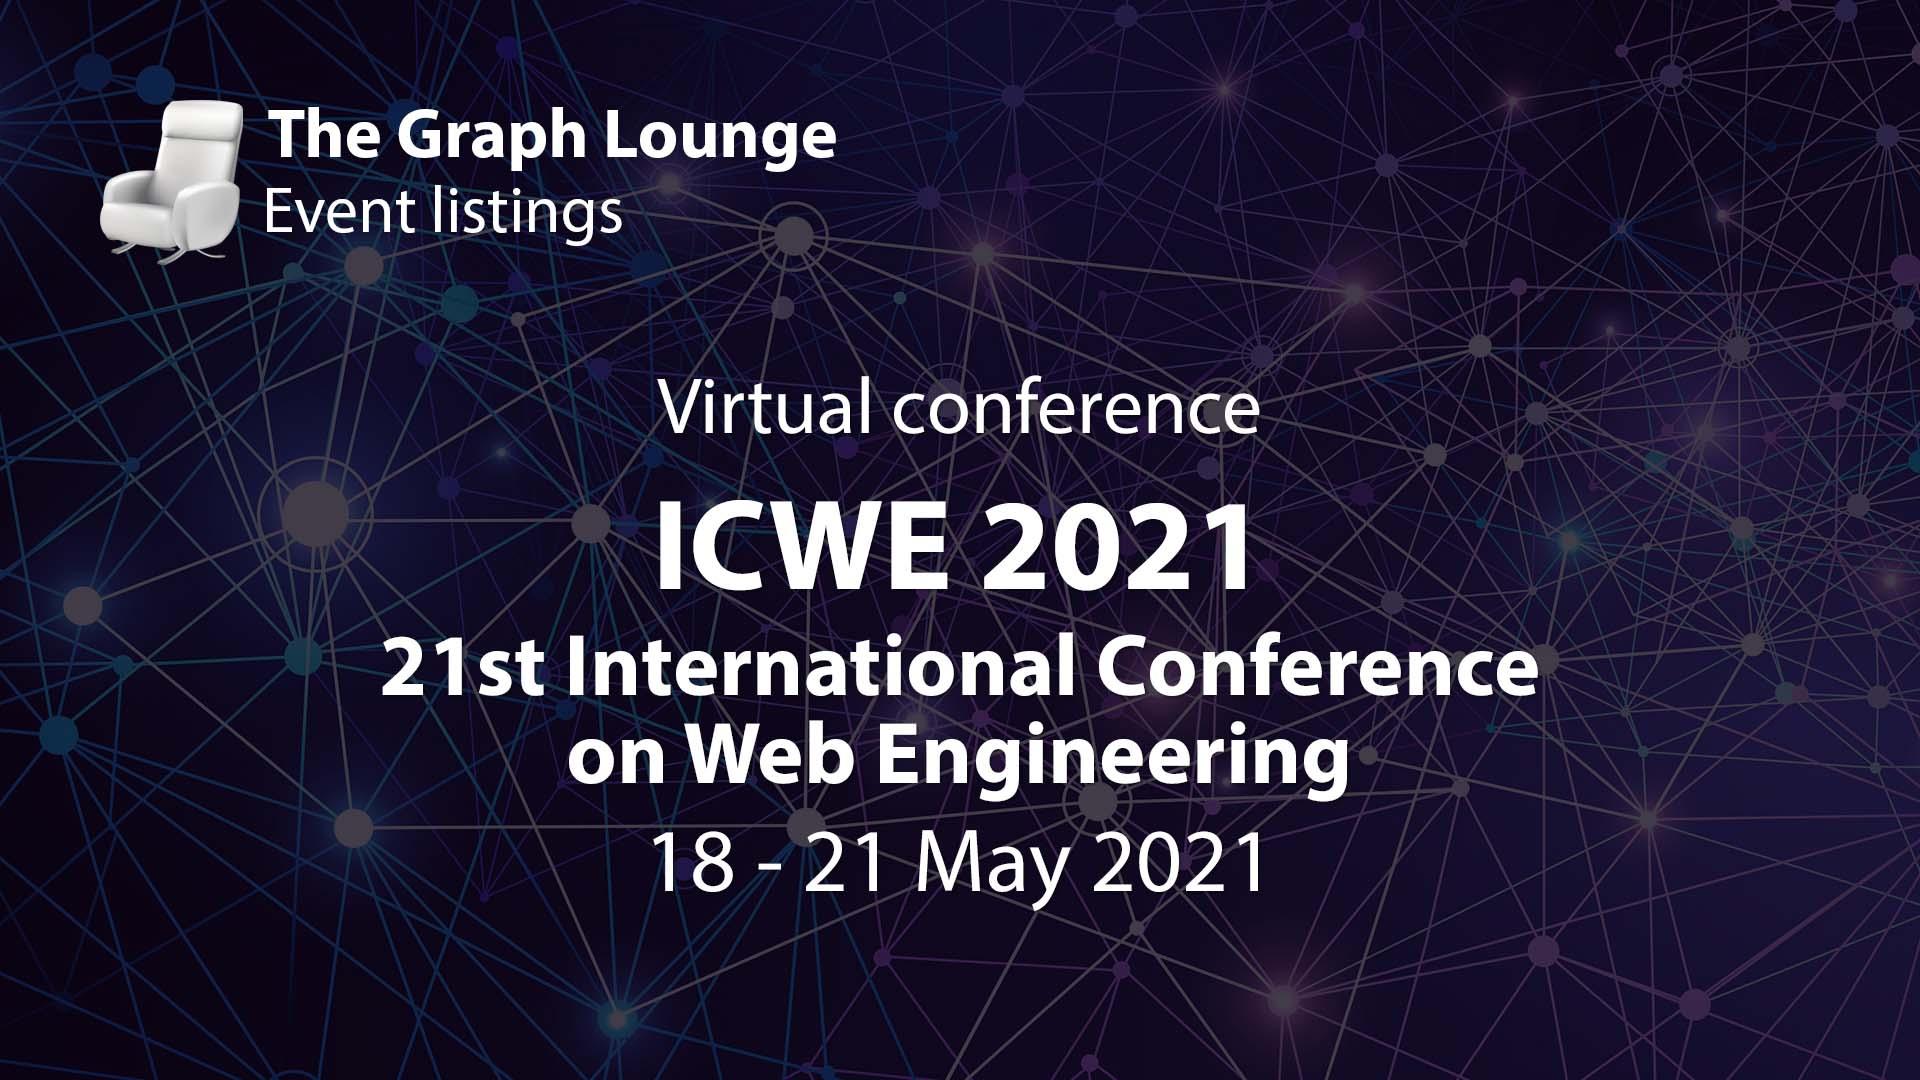 ICWE 2021 (21st International Conference on Web Engineering)